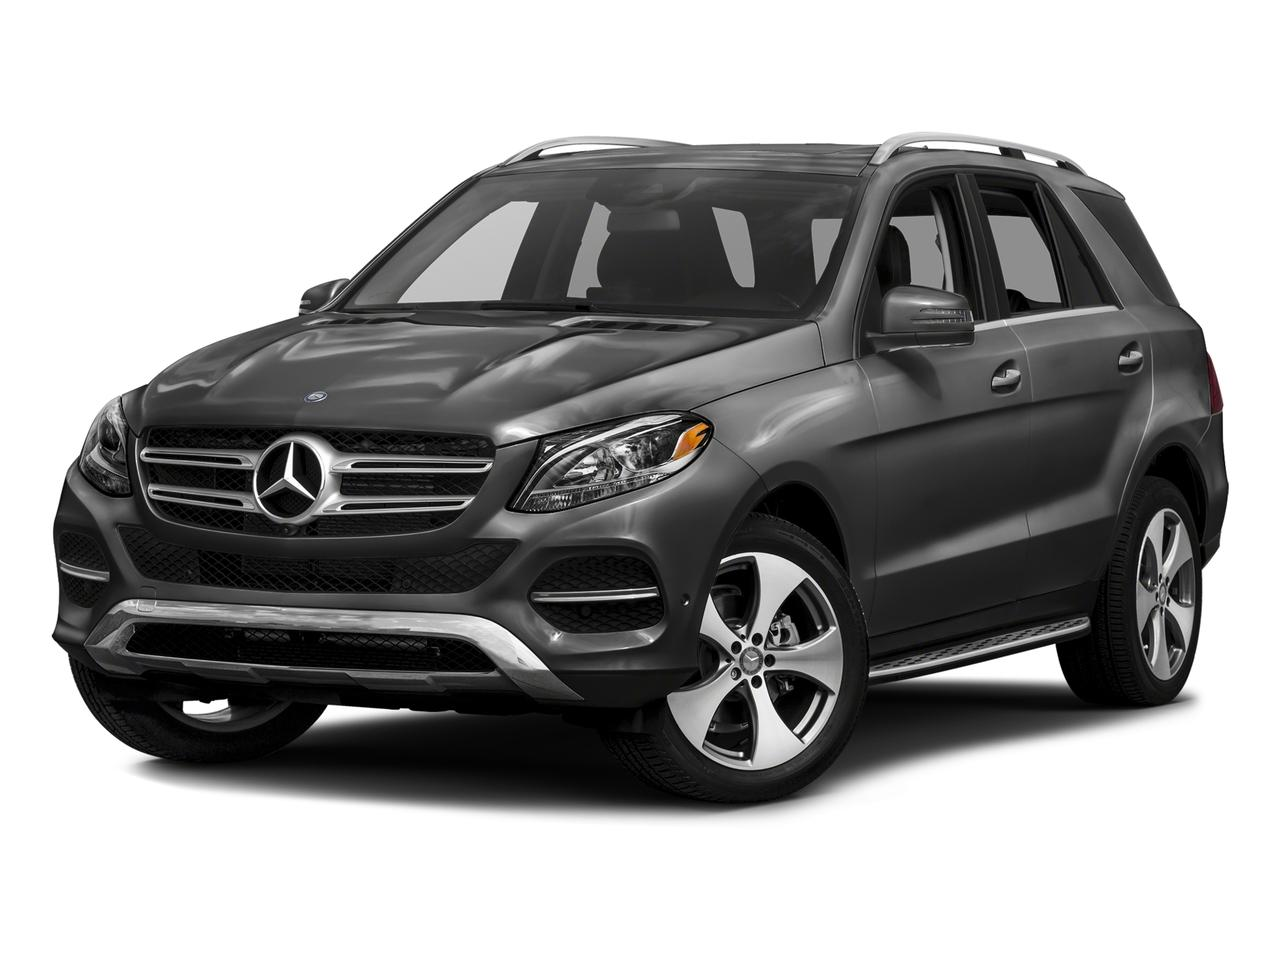 2016 Mercedes-Benz GLE Vehicle Photo in Flemington, NJ 08822